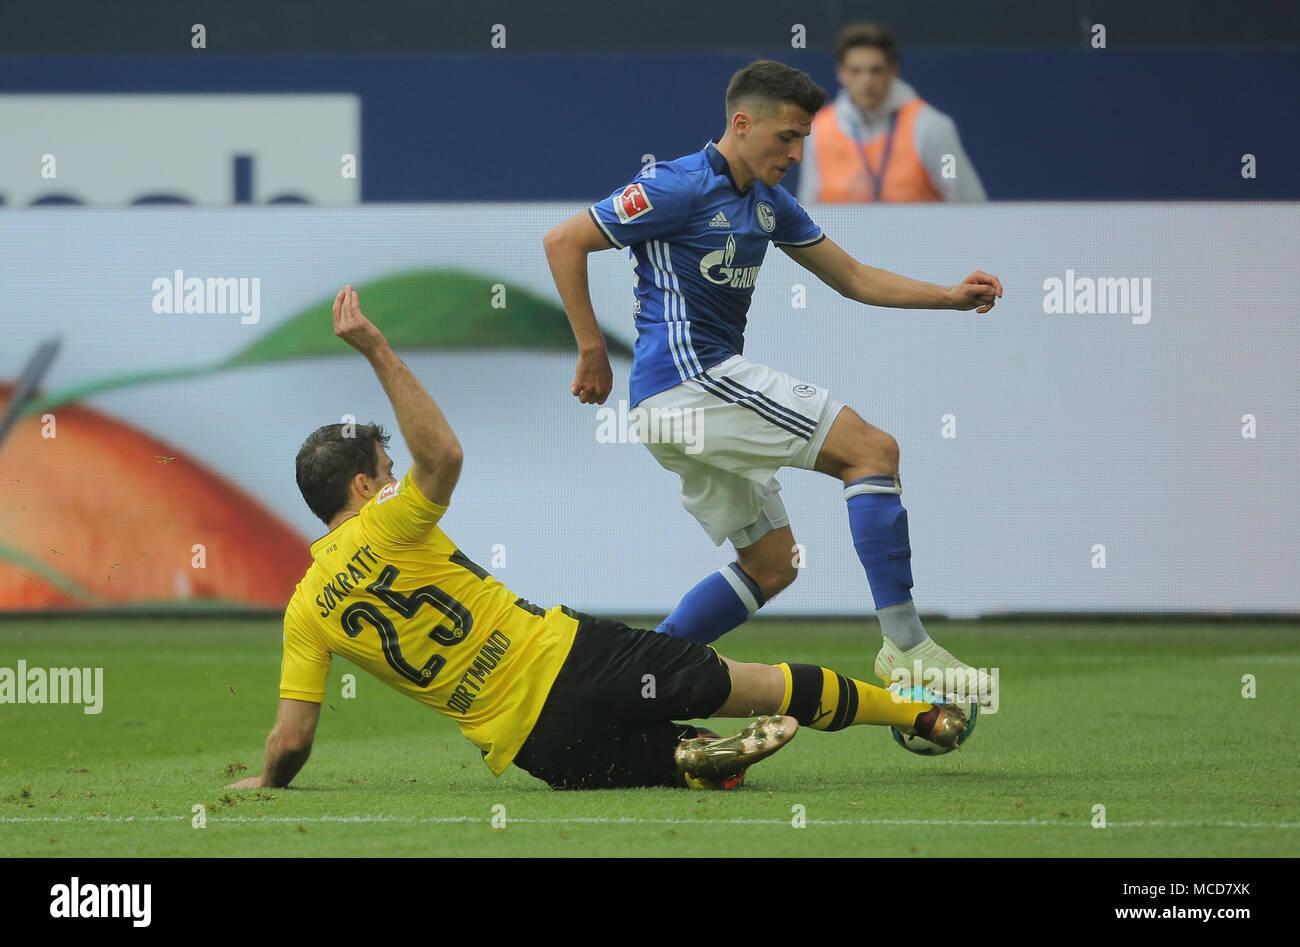 Gelsenkirchen, Germania 15 aprile 2018, Bundesliga giornata 30, FC Schalke 04 vs BV Borussia Dortmund: Sokratis (Dortmund) e Alessandro Andre Schoepf (Schalke) in concorrenza. Credito: Juergen schwarz/Alamy Live News Foto Stock